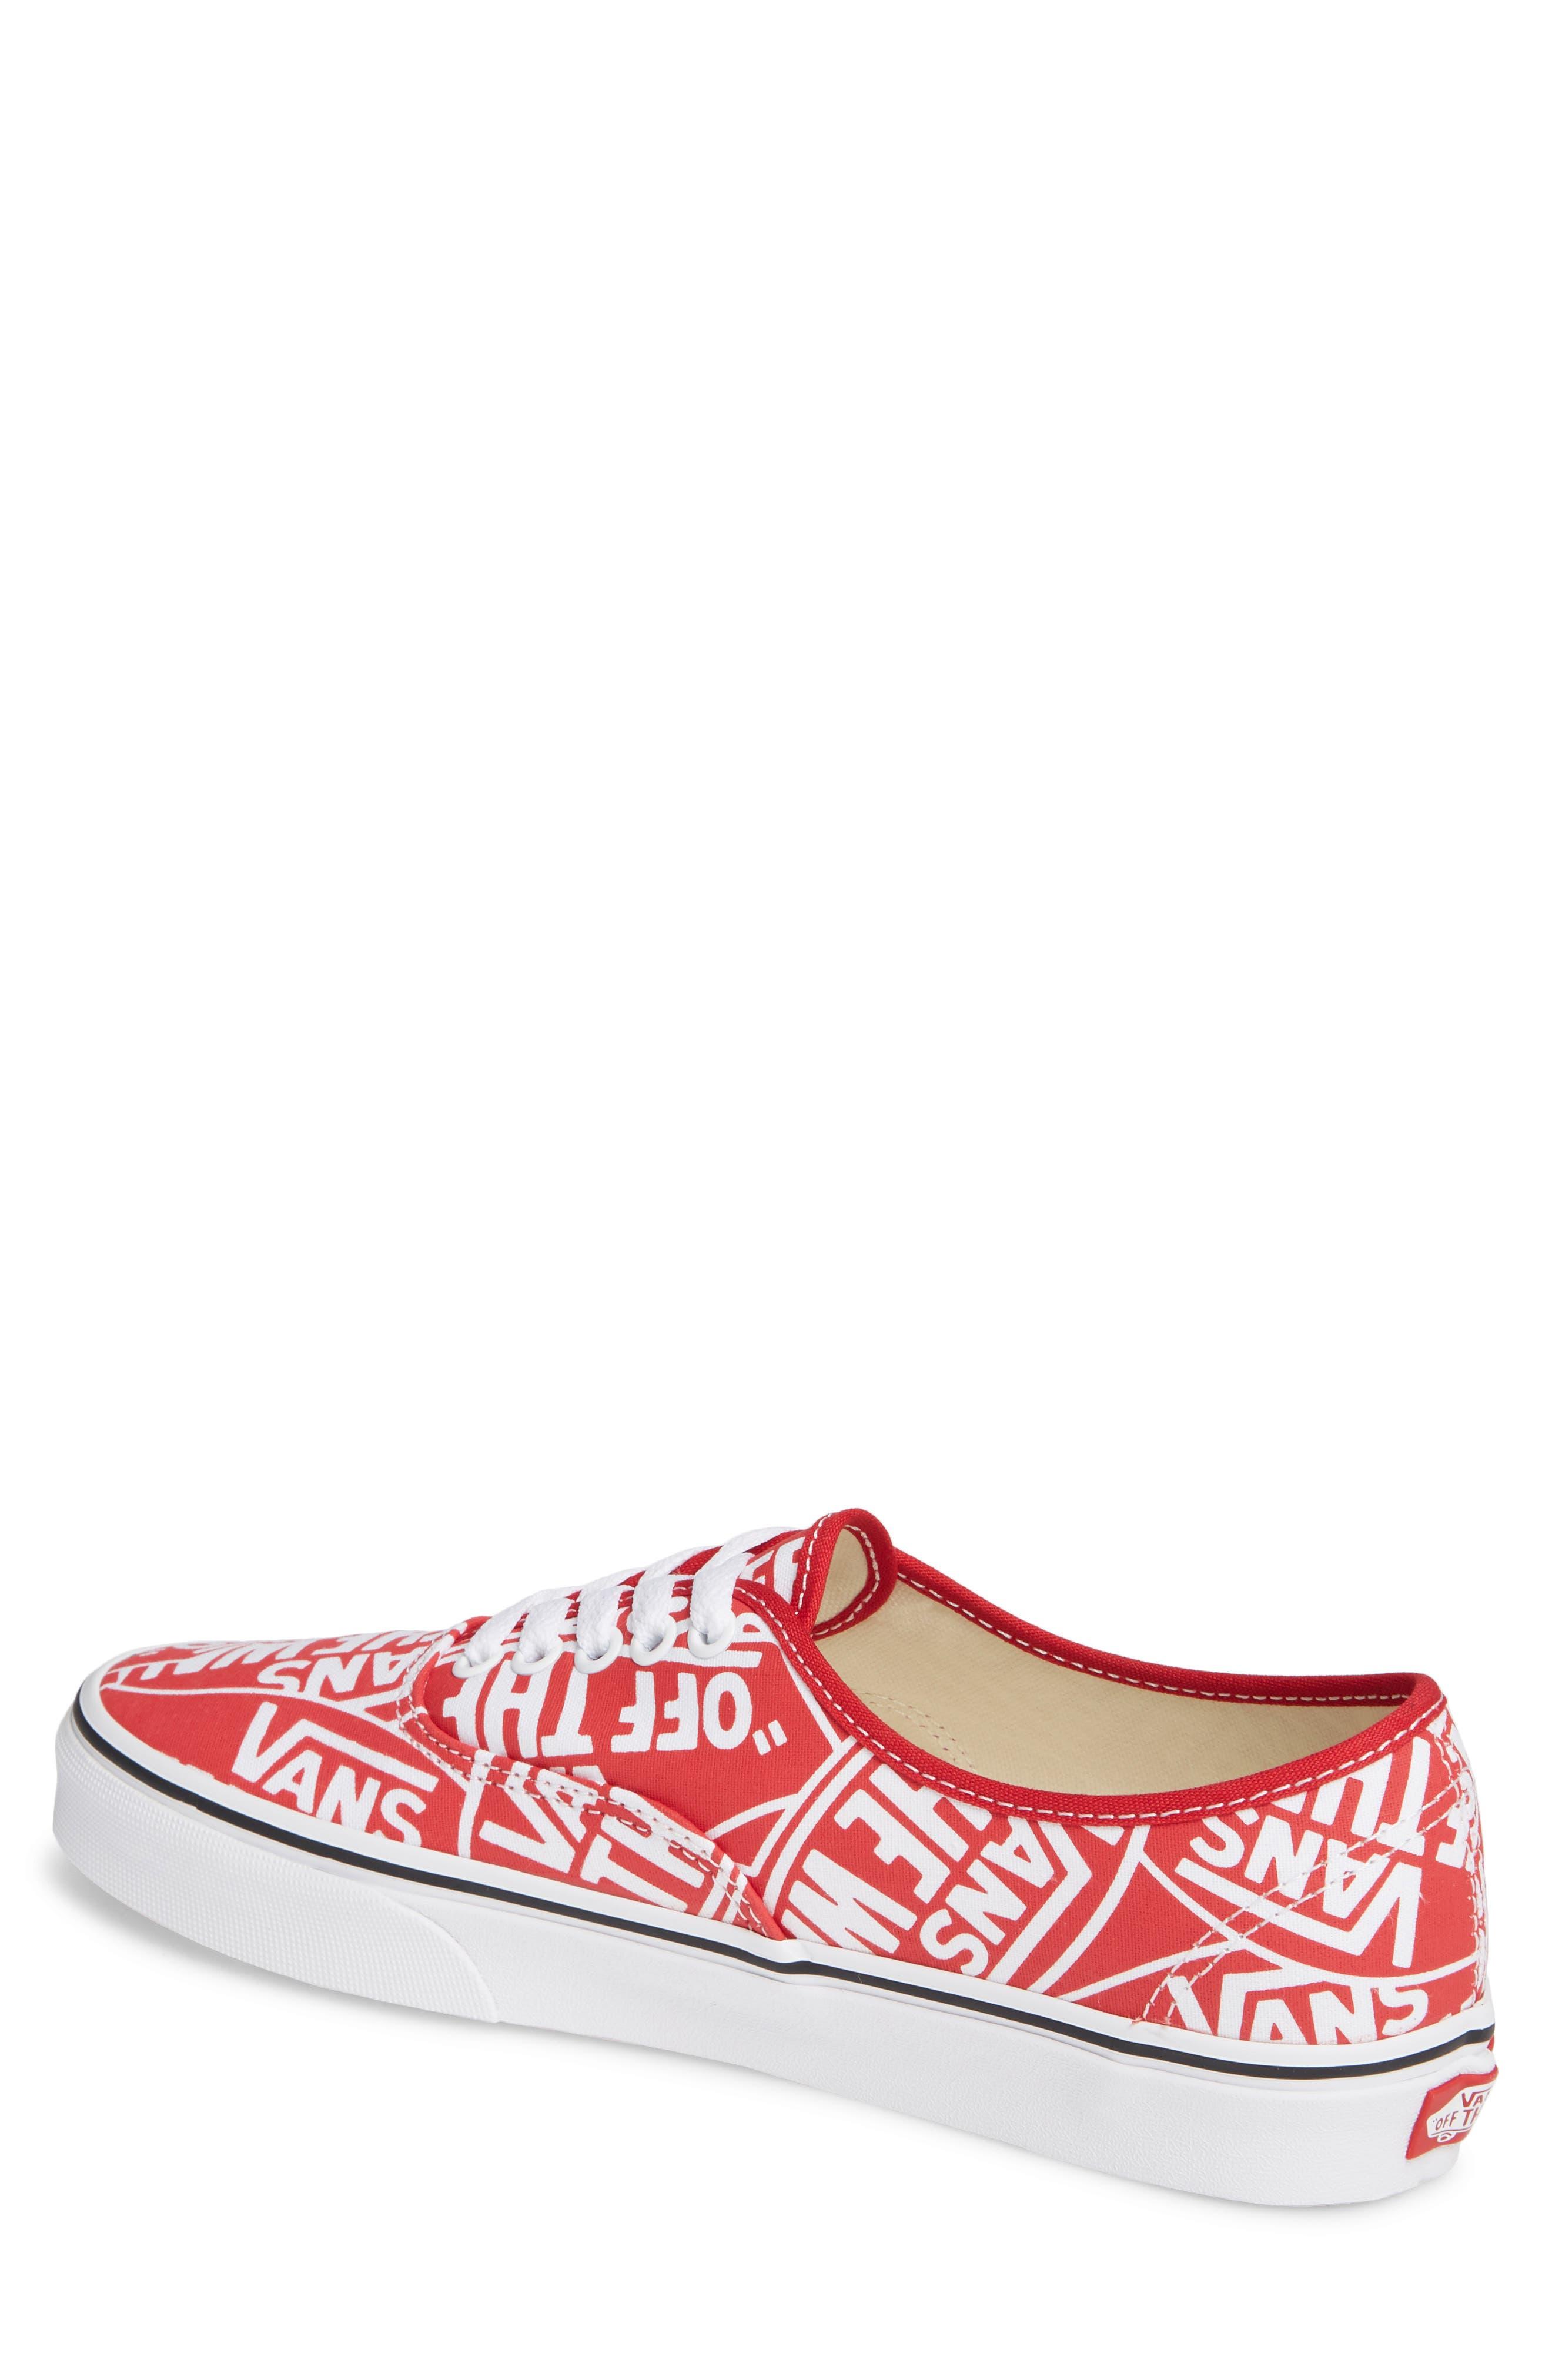 Authentic Sneaker,                             Alternate thumbnail 2, color,                             610